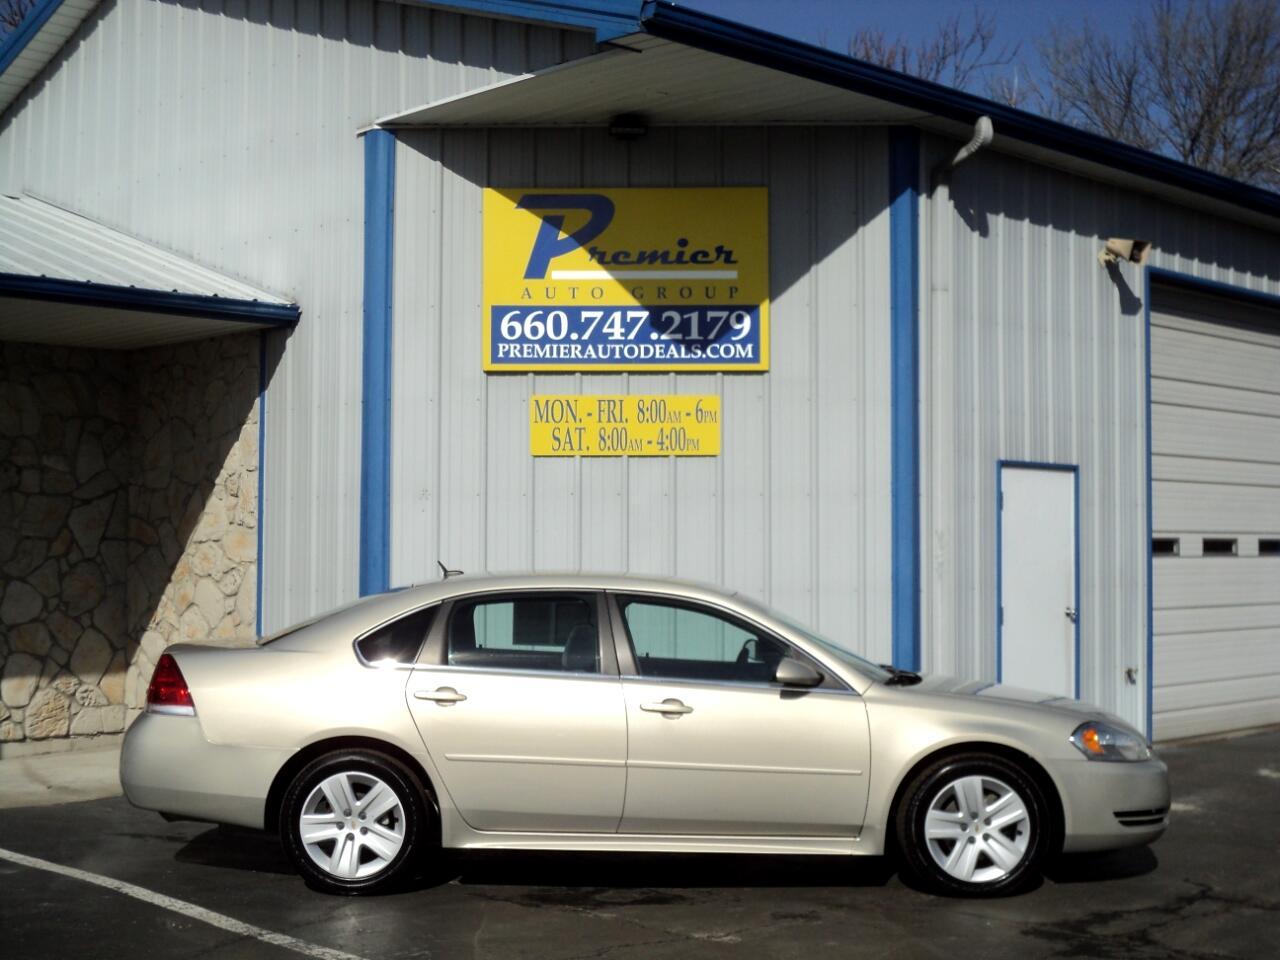 Chevrolet Impala 4dr Sdn LS Retail 2011